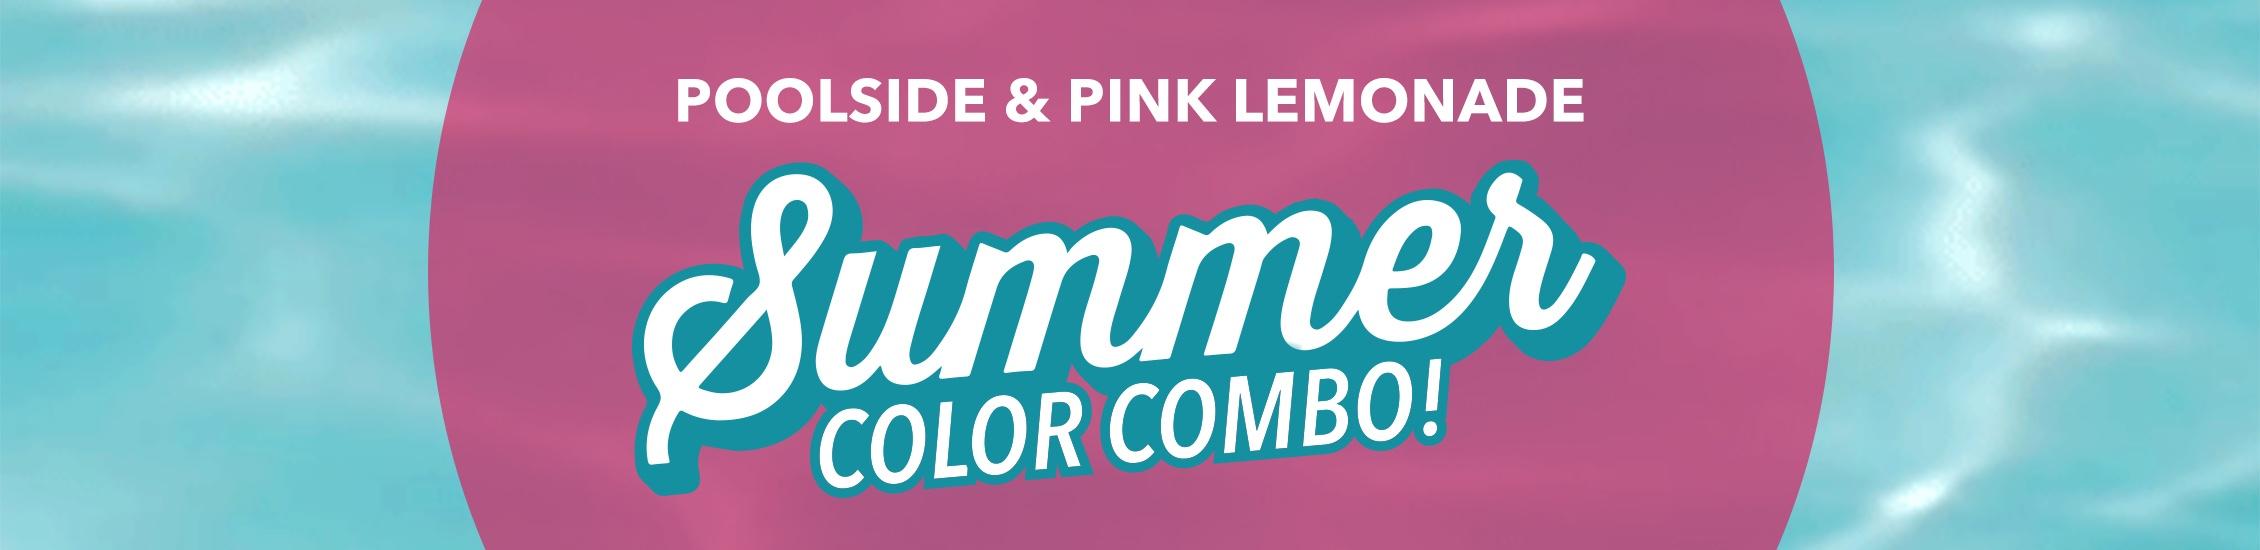 Summer Color Combo - Poolside & Pink Lemonade